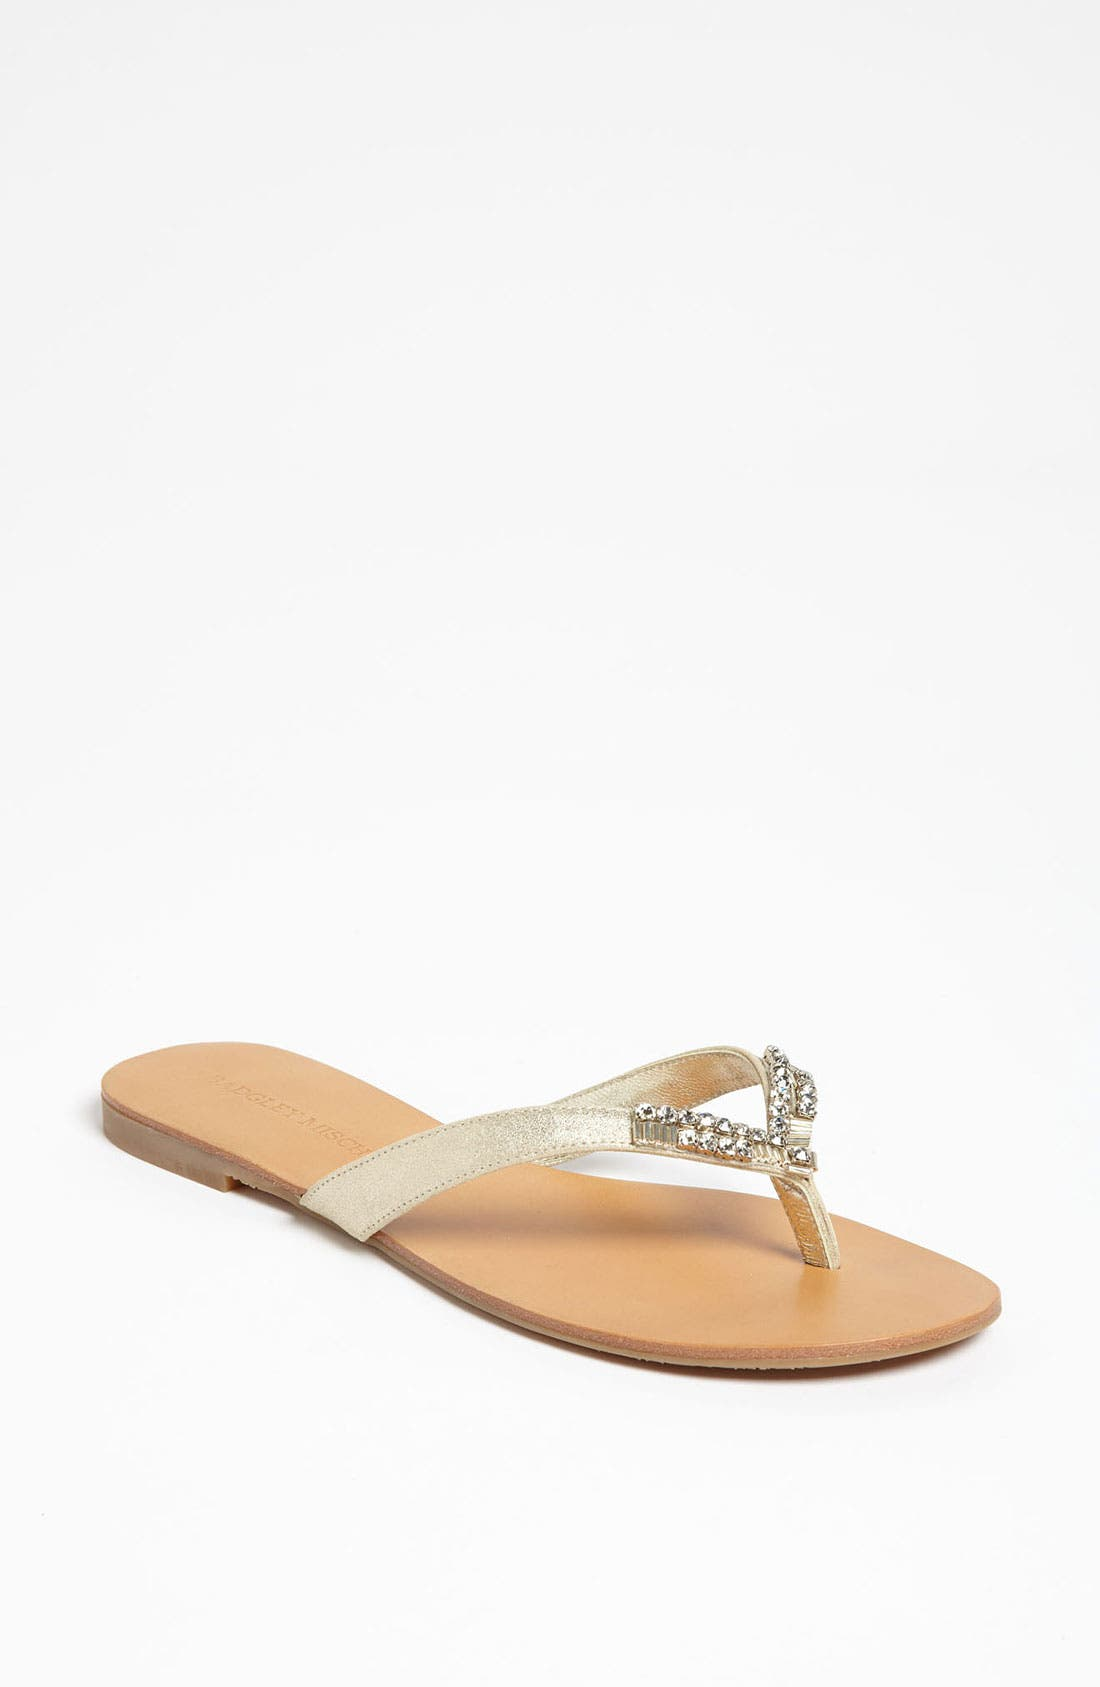 Main Image - Badgley Mischka 'Alee' Sandal